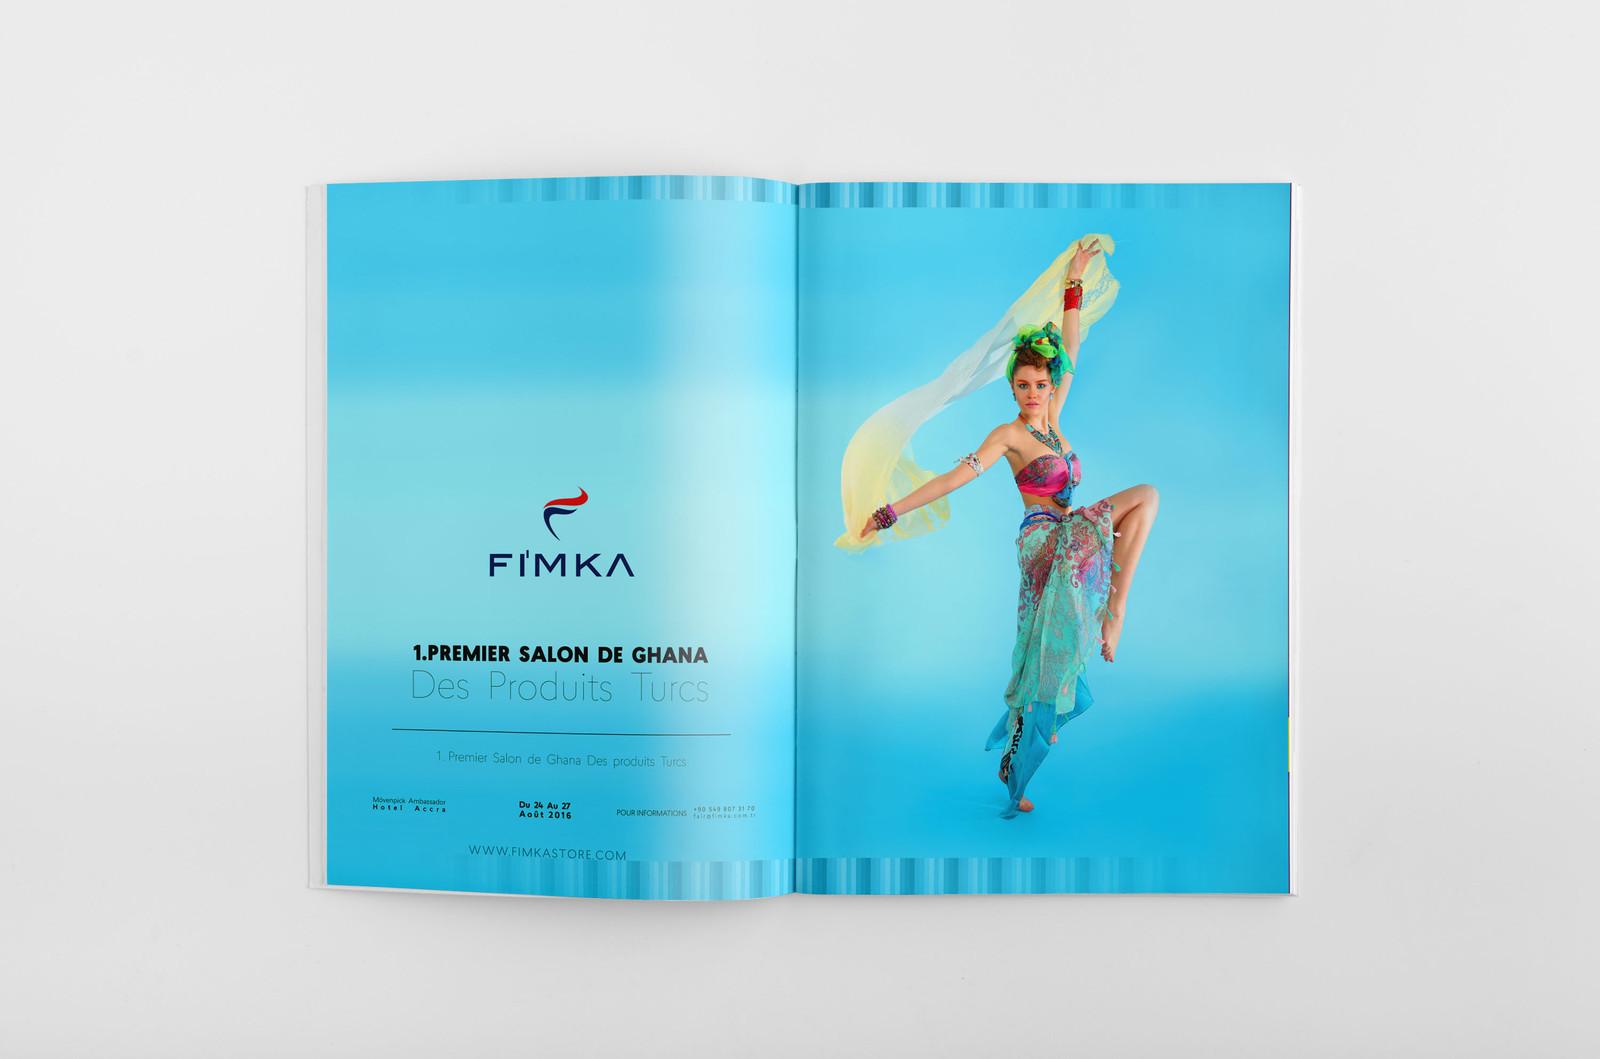 Fimka